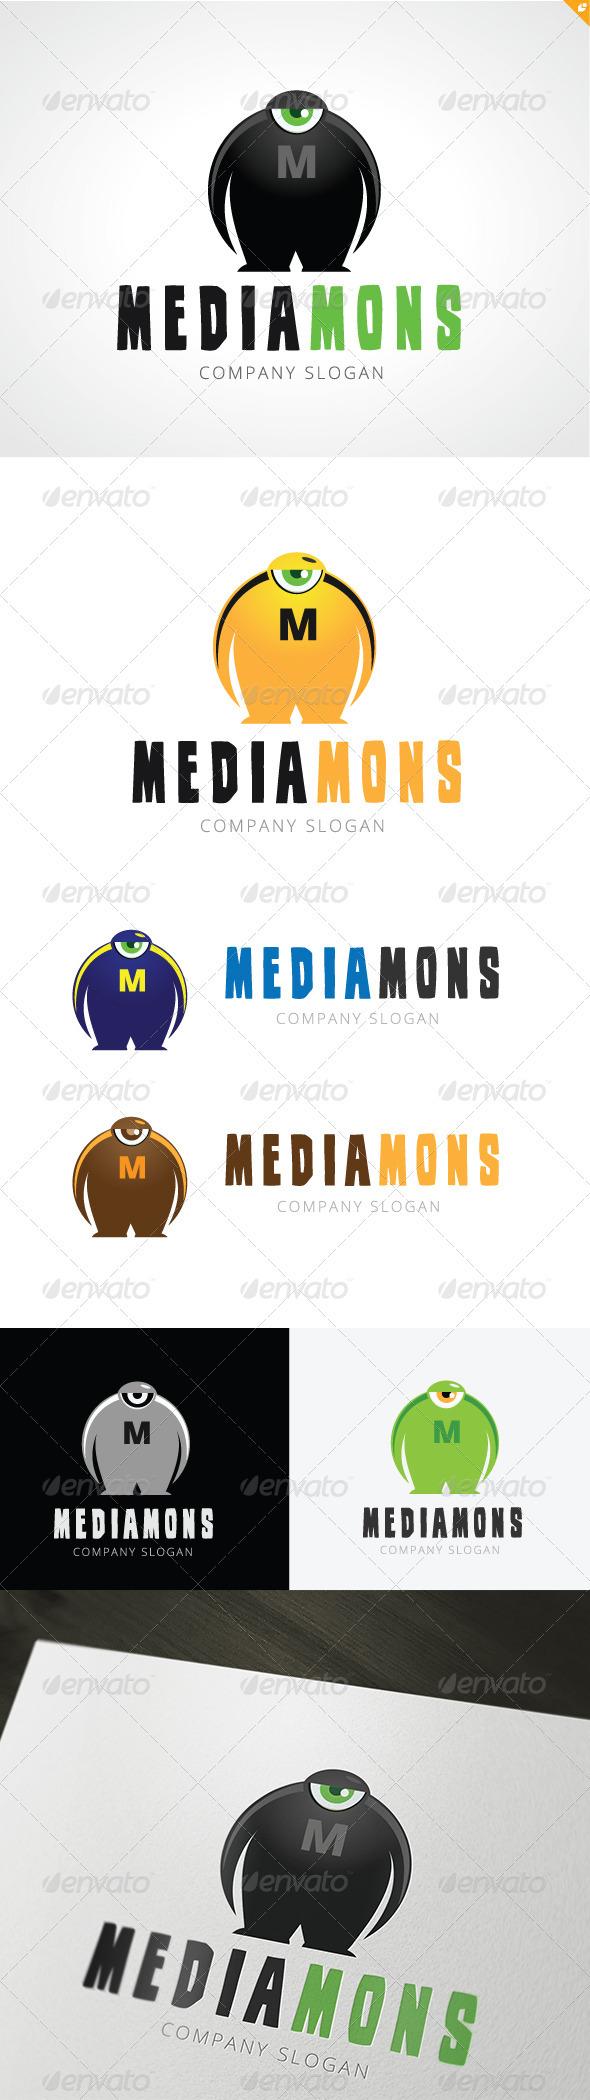 Mediamons Logo - Letters Logo Templates